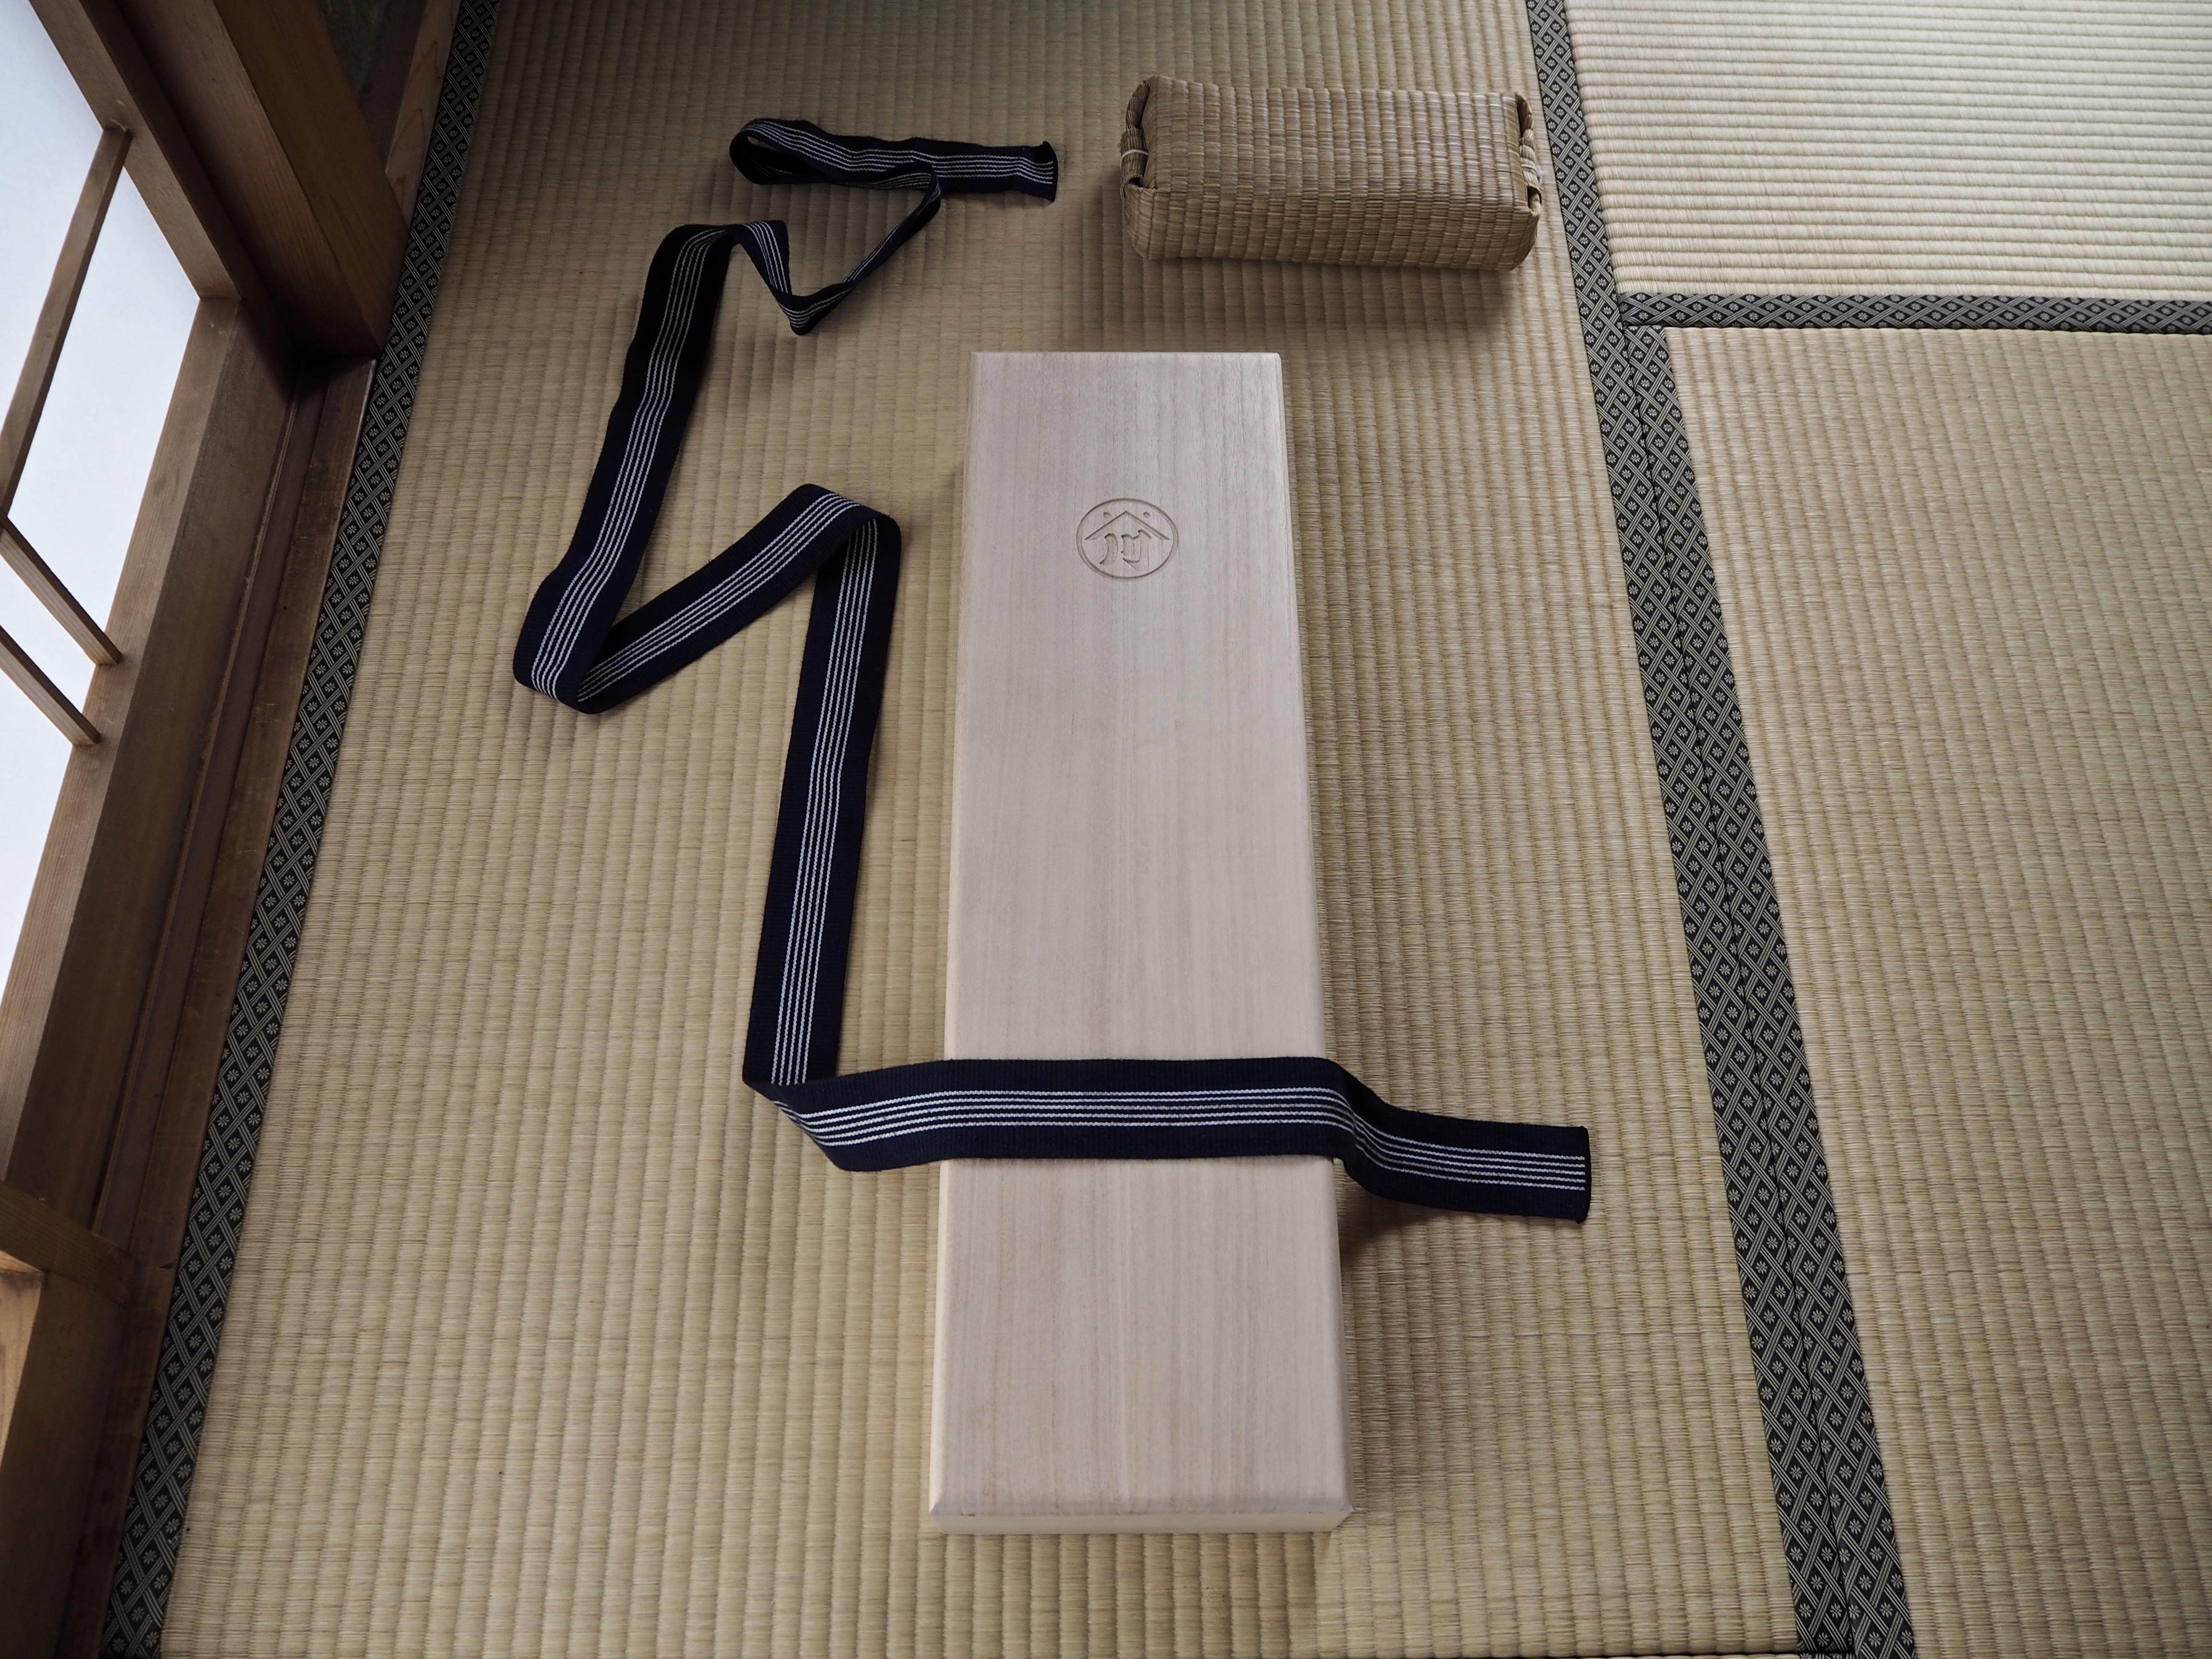 Spear case 槍桐箱